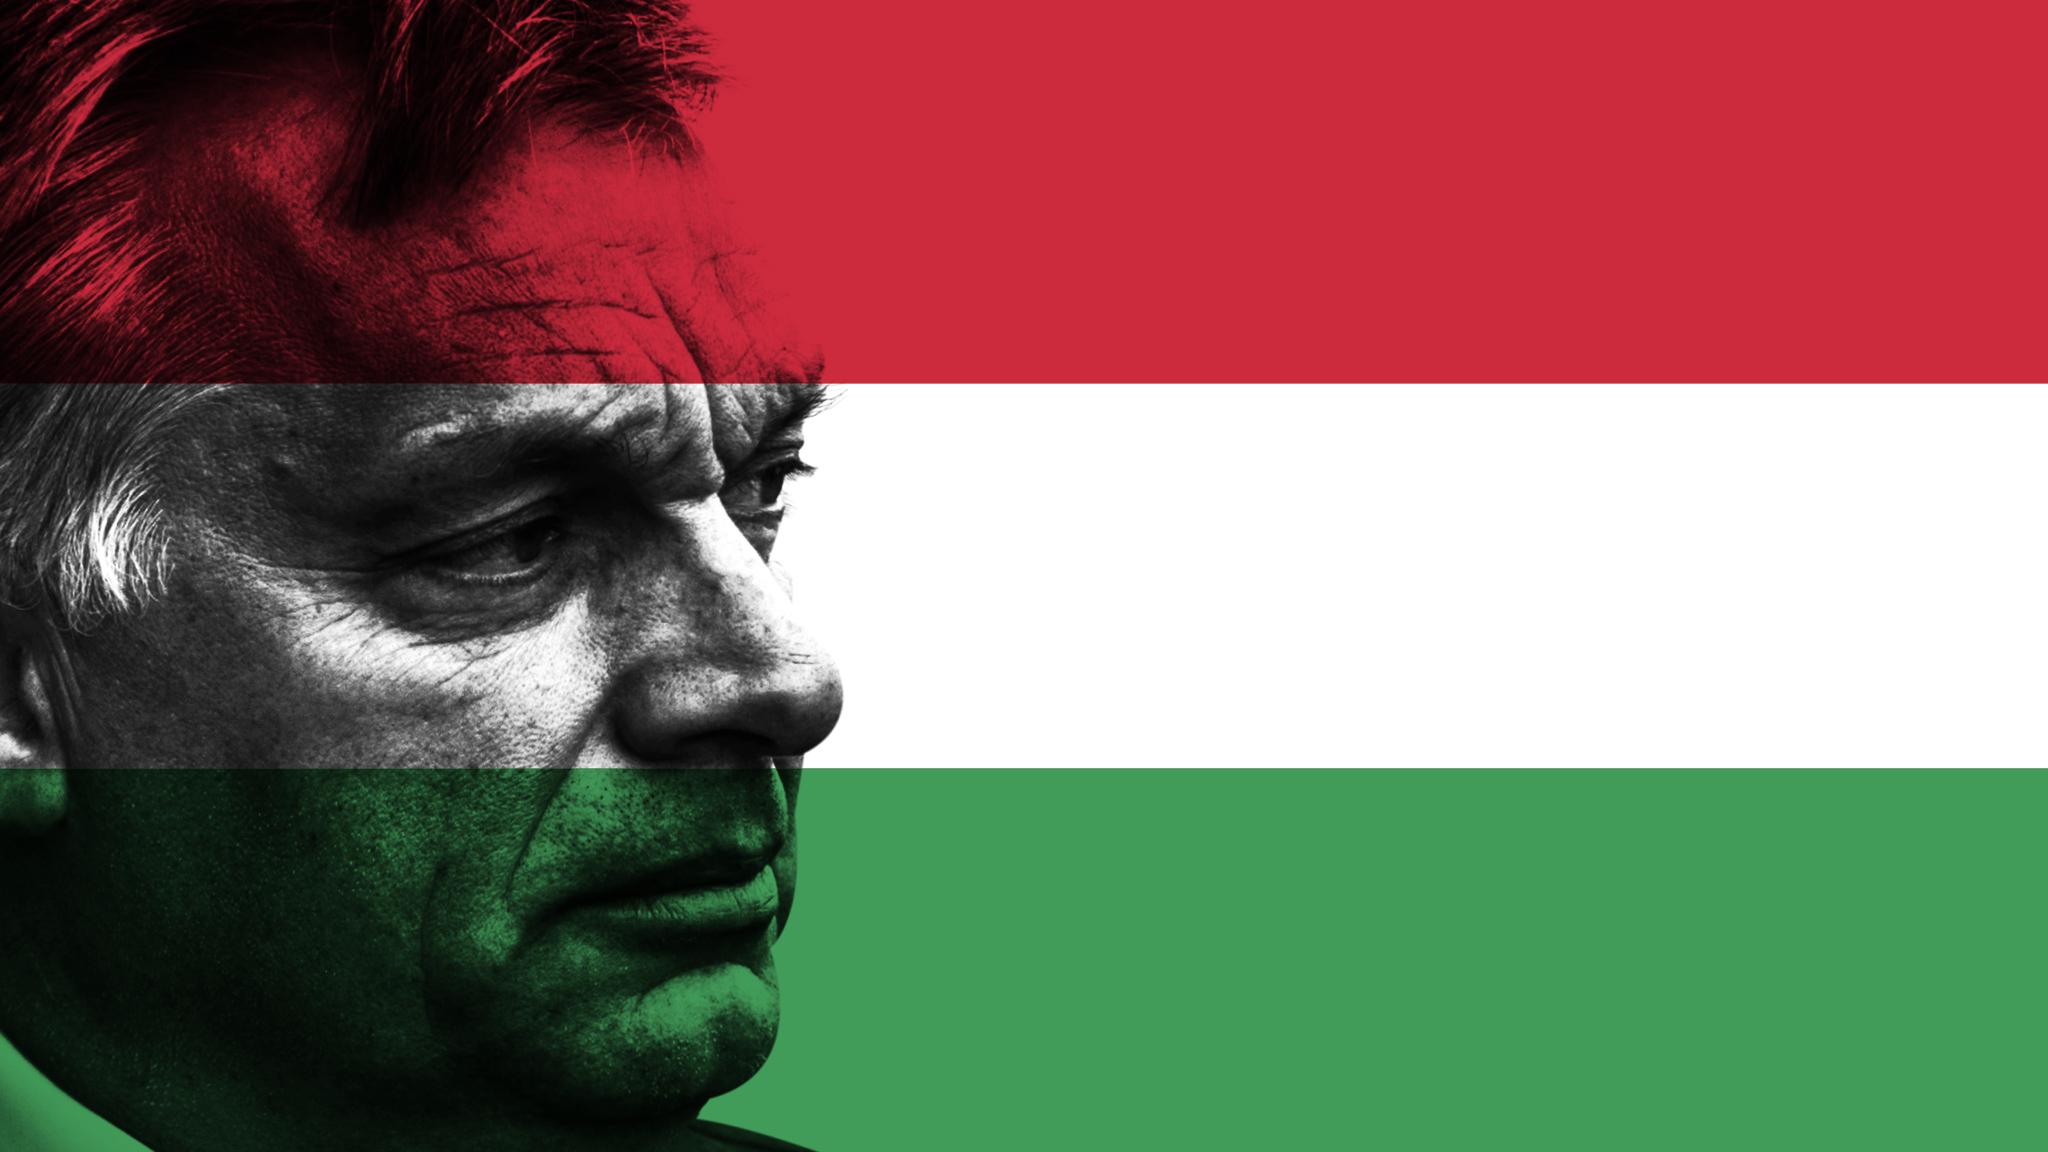 Viktor Orban: the nationalist leader threatening EU values